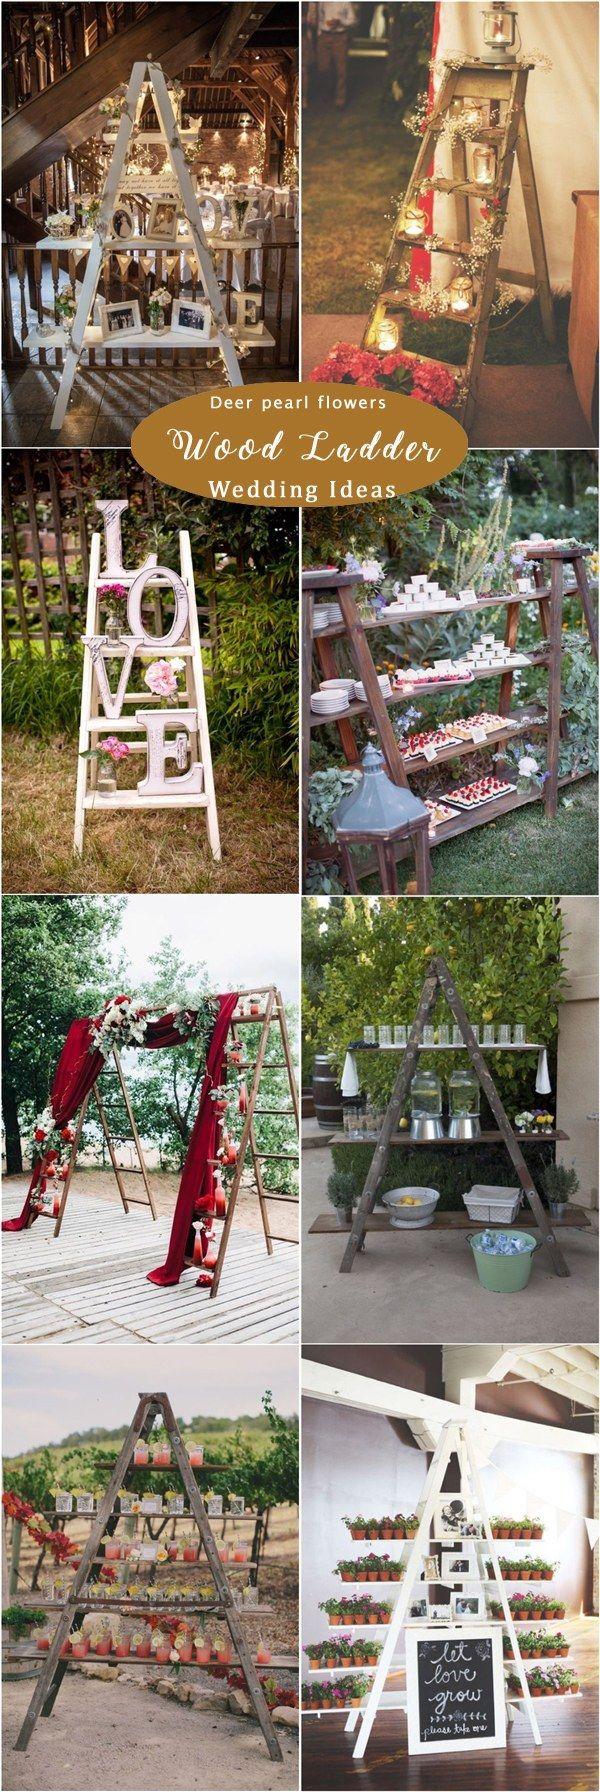 Wooden wedding decor ideas   Rustic Woodsy Wedding Decor Ideas for   Pinterest  Wooden